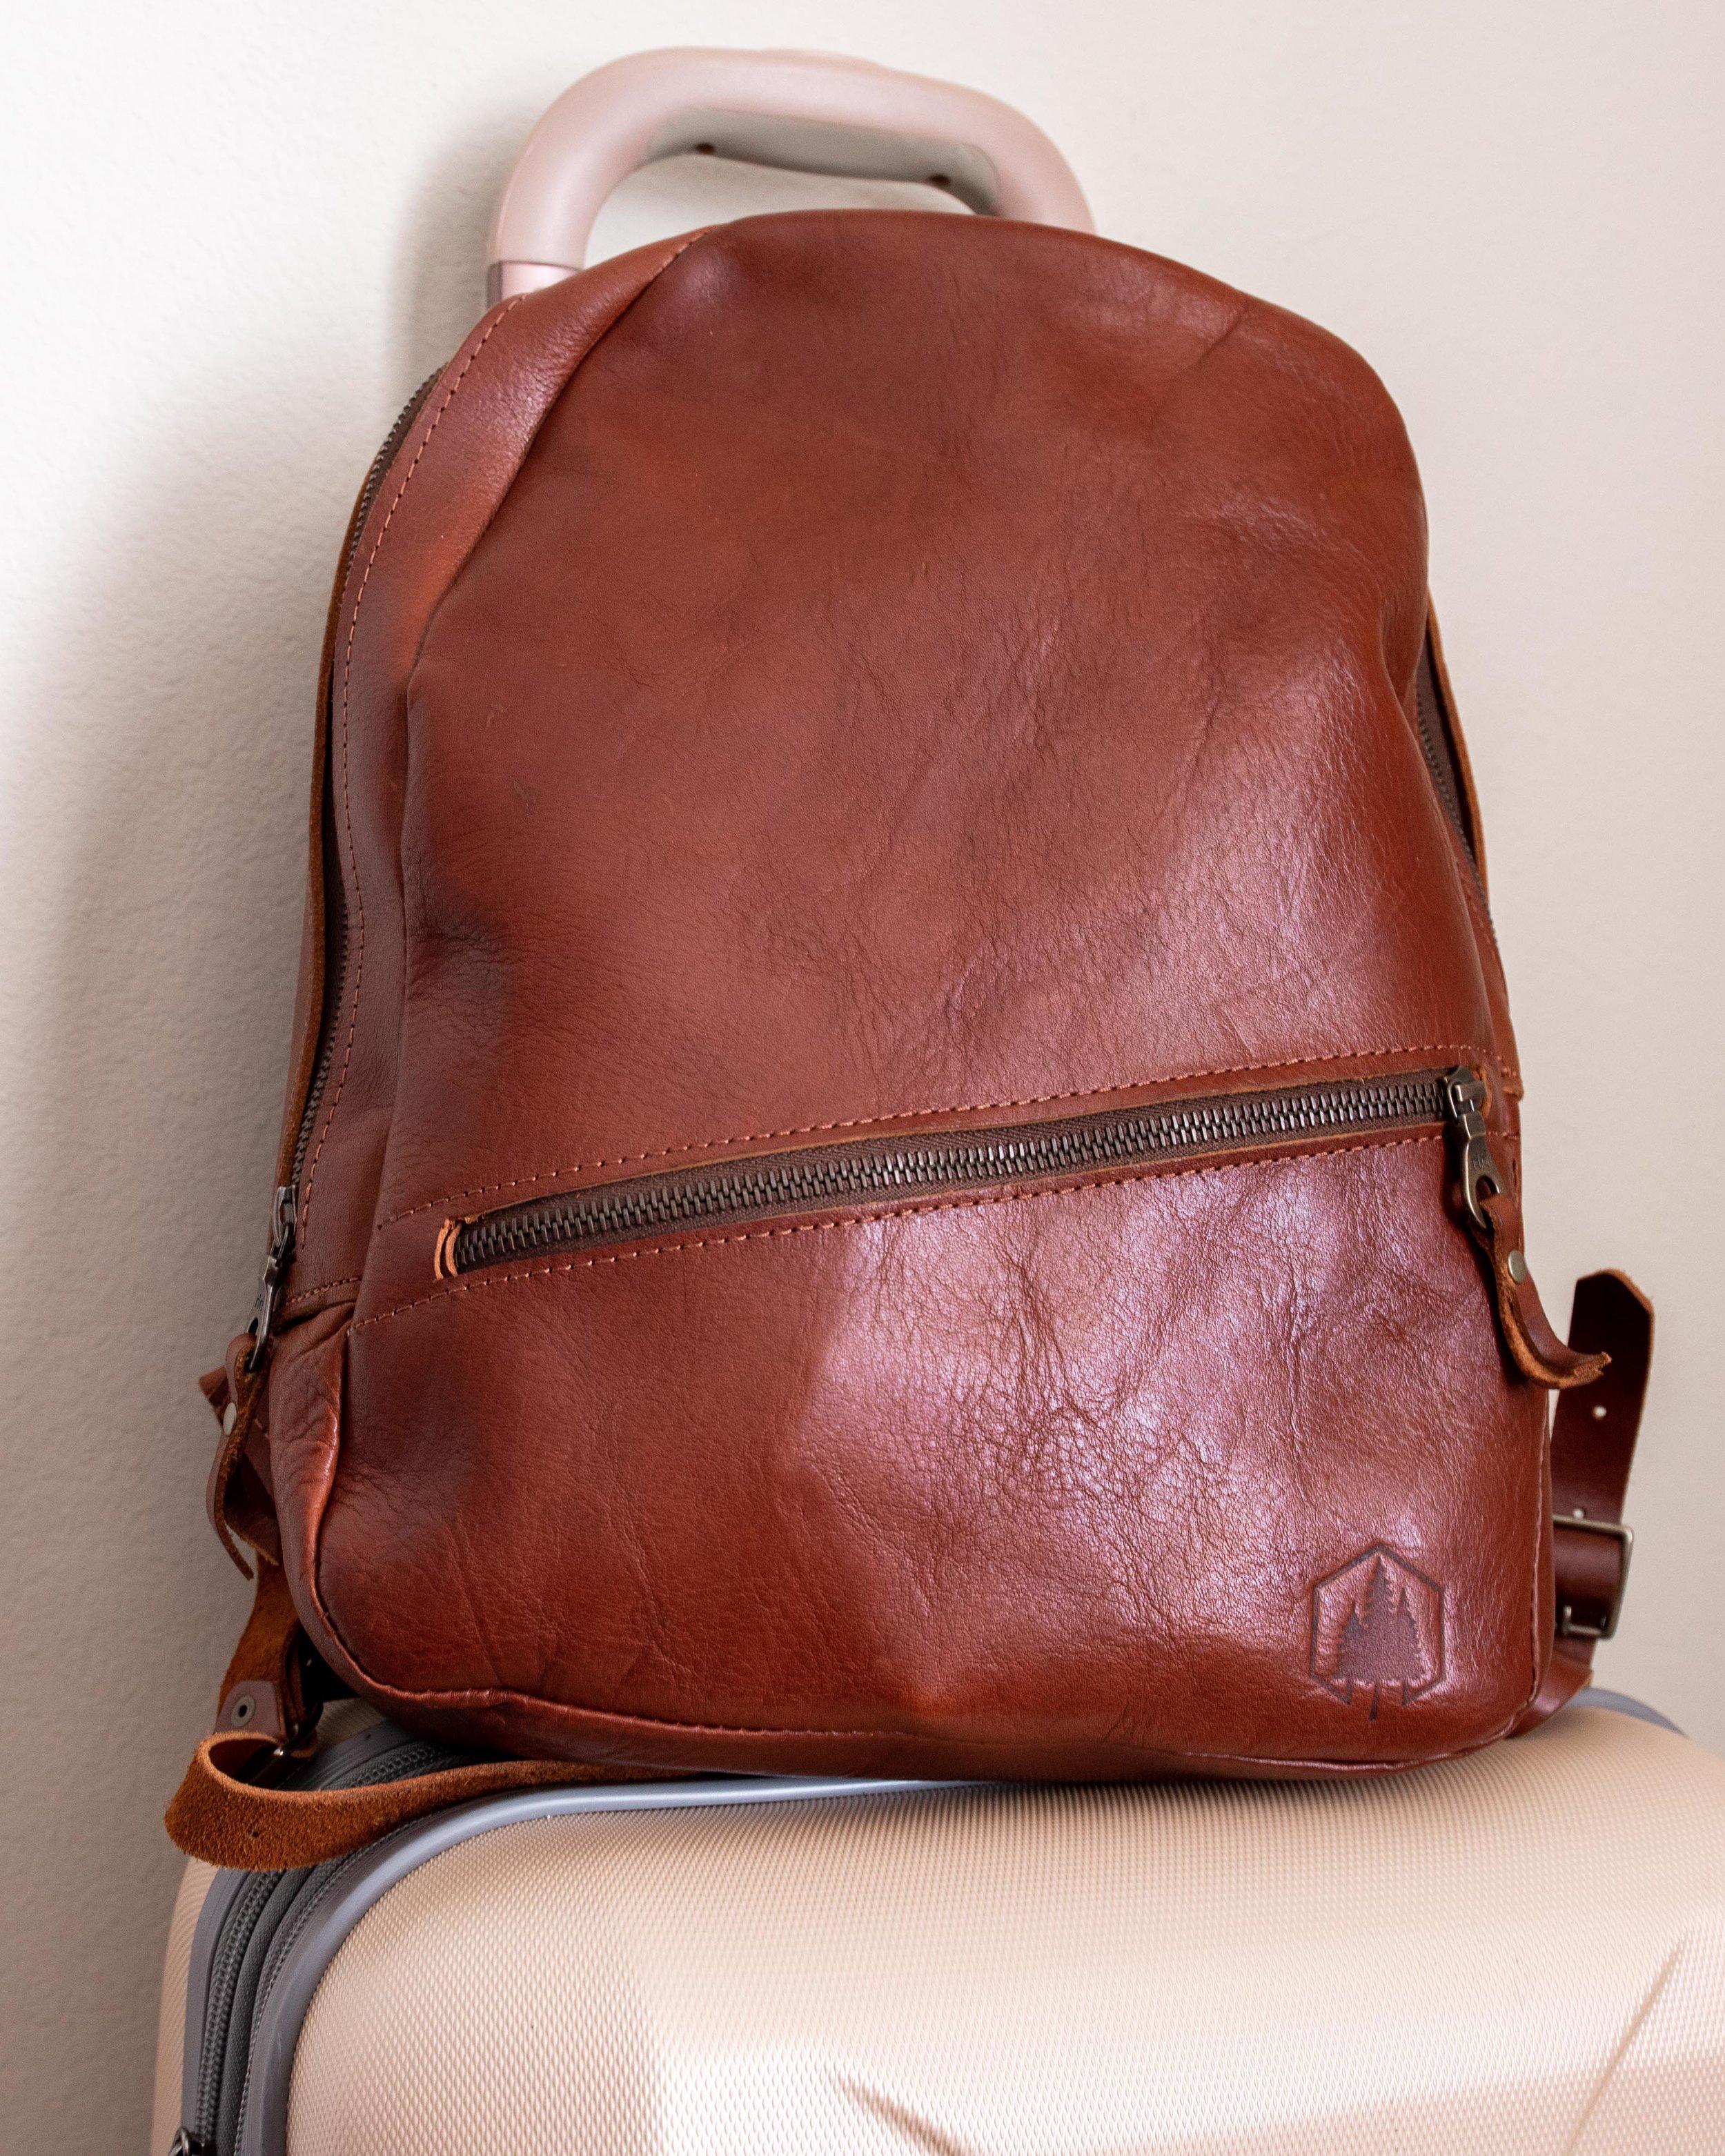 My Uphill Designs bag.